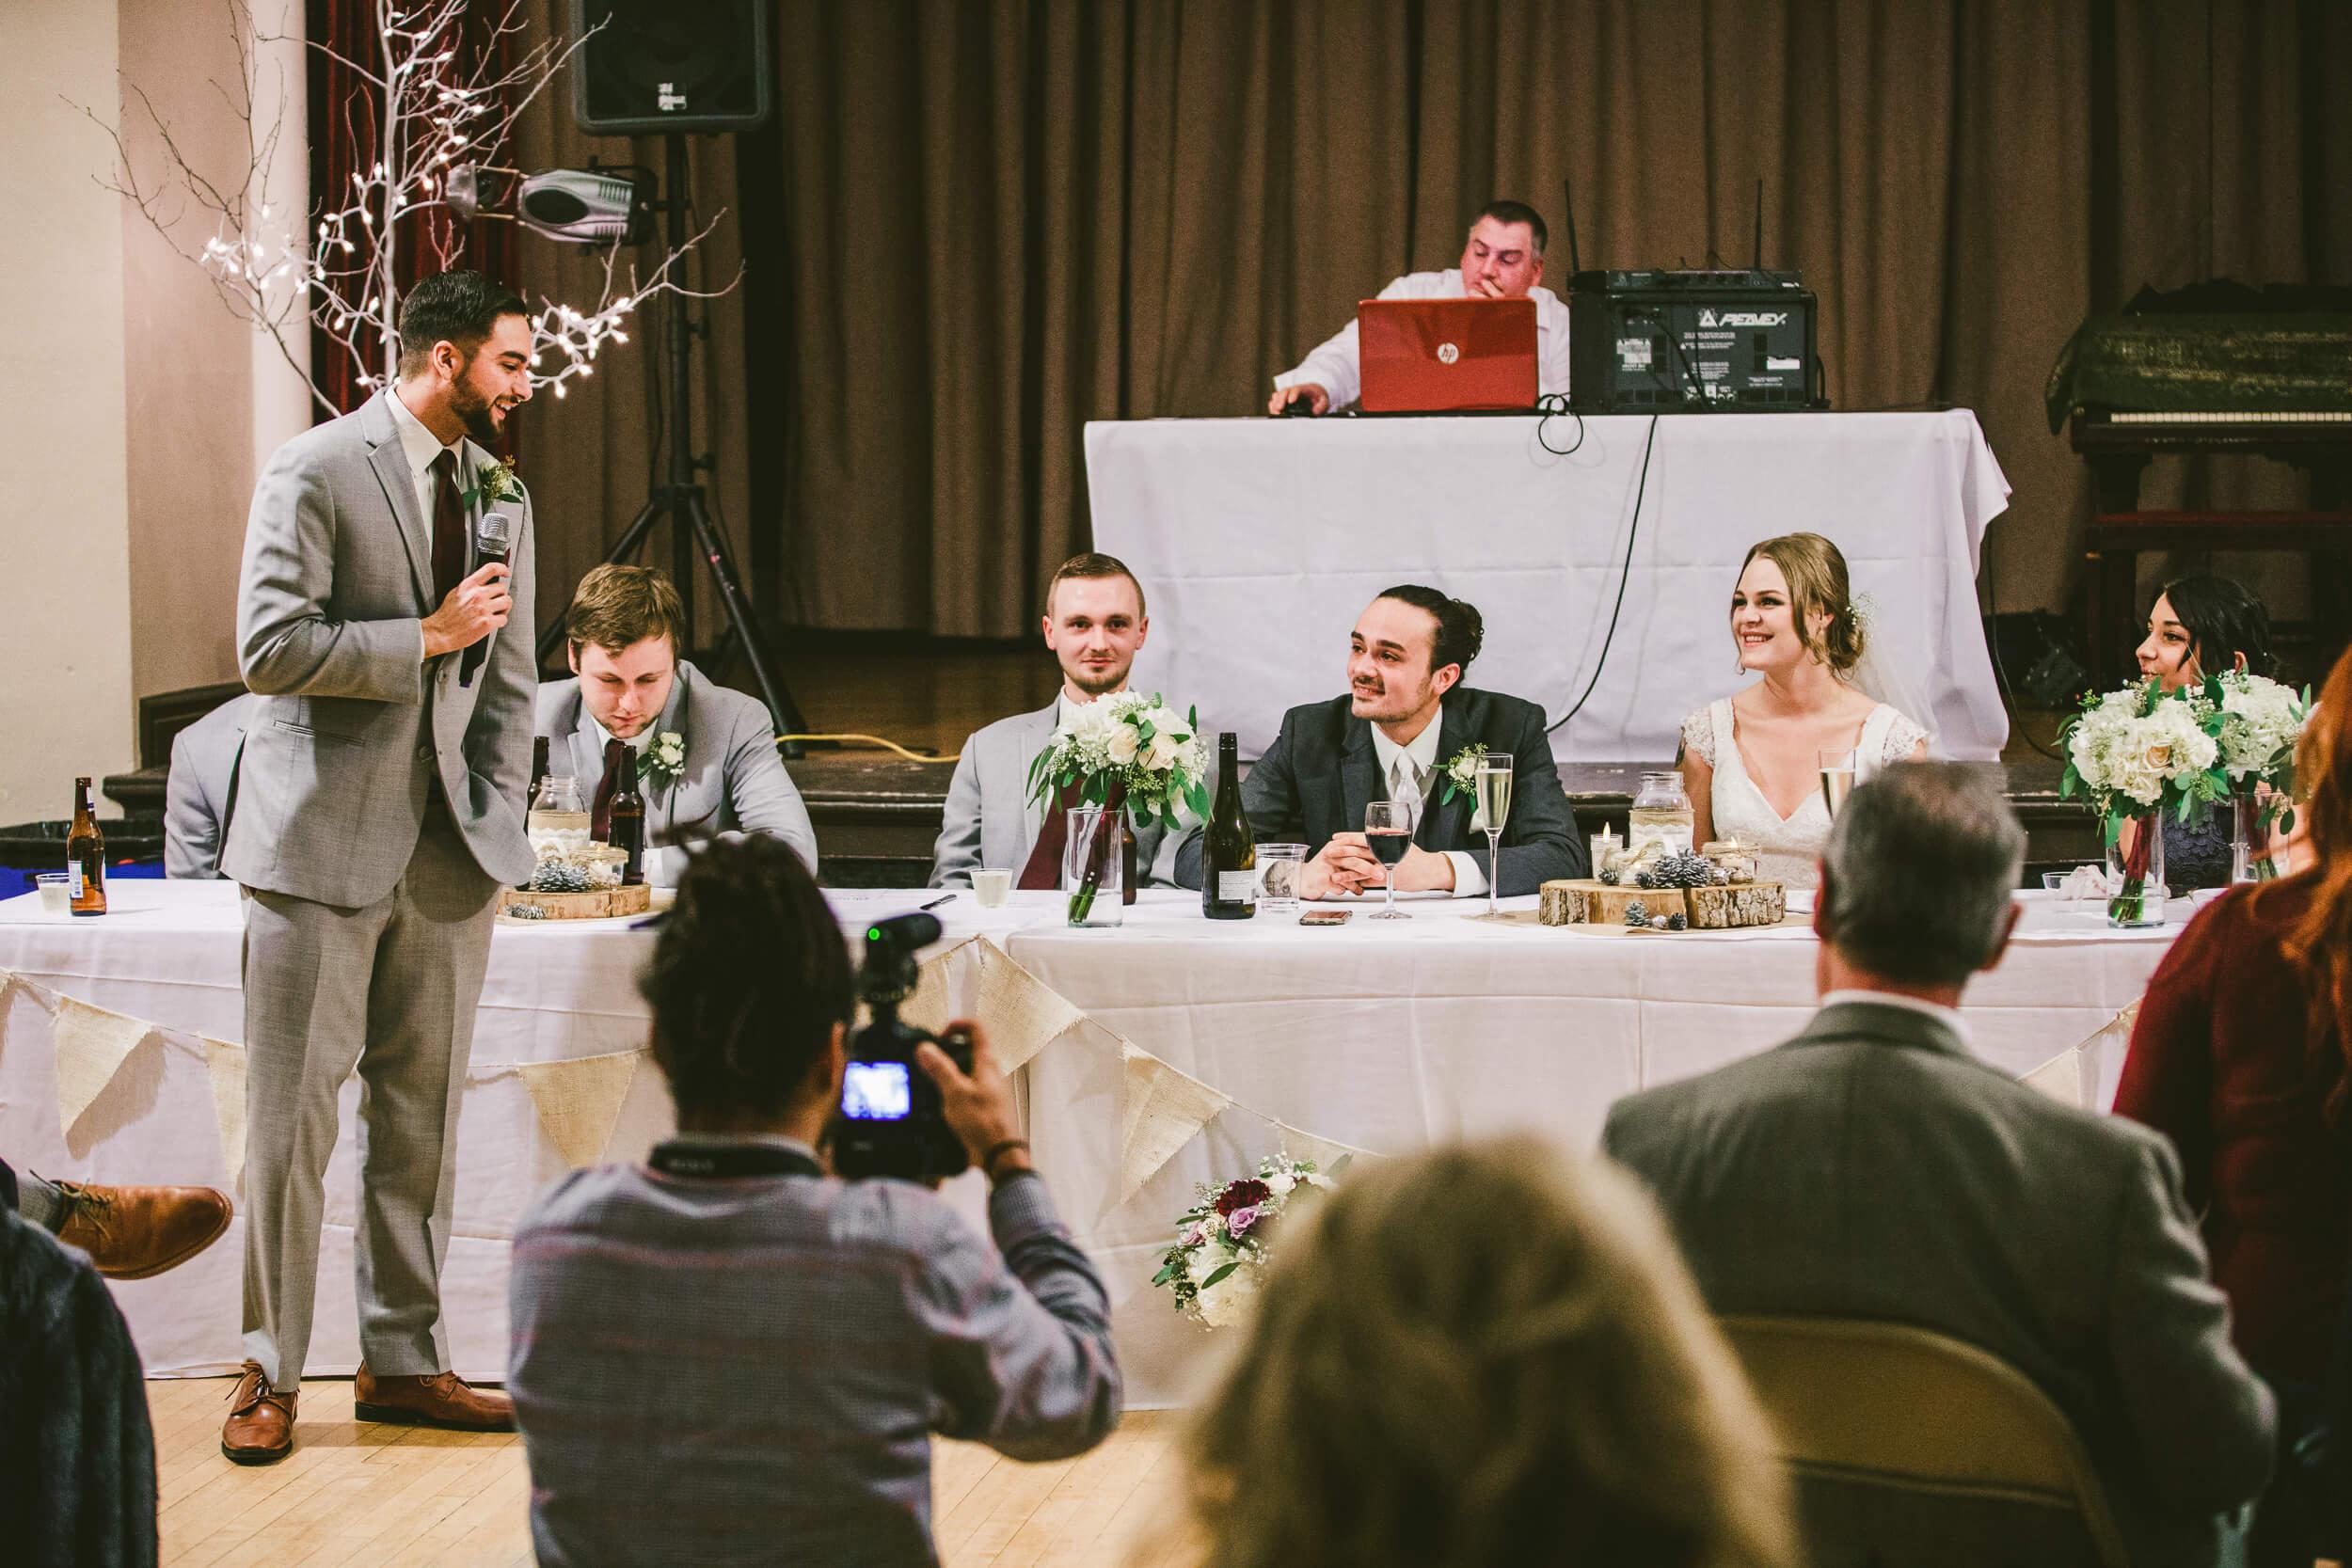 mukogawa winter wedding in spokane (238).jpg